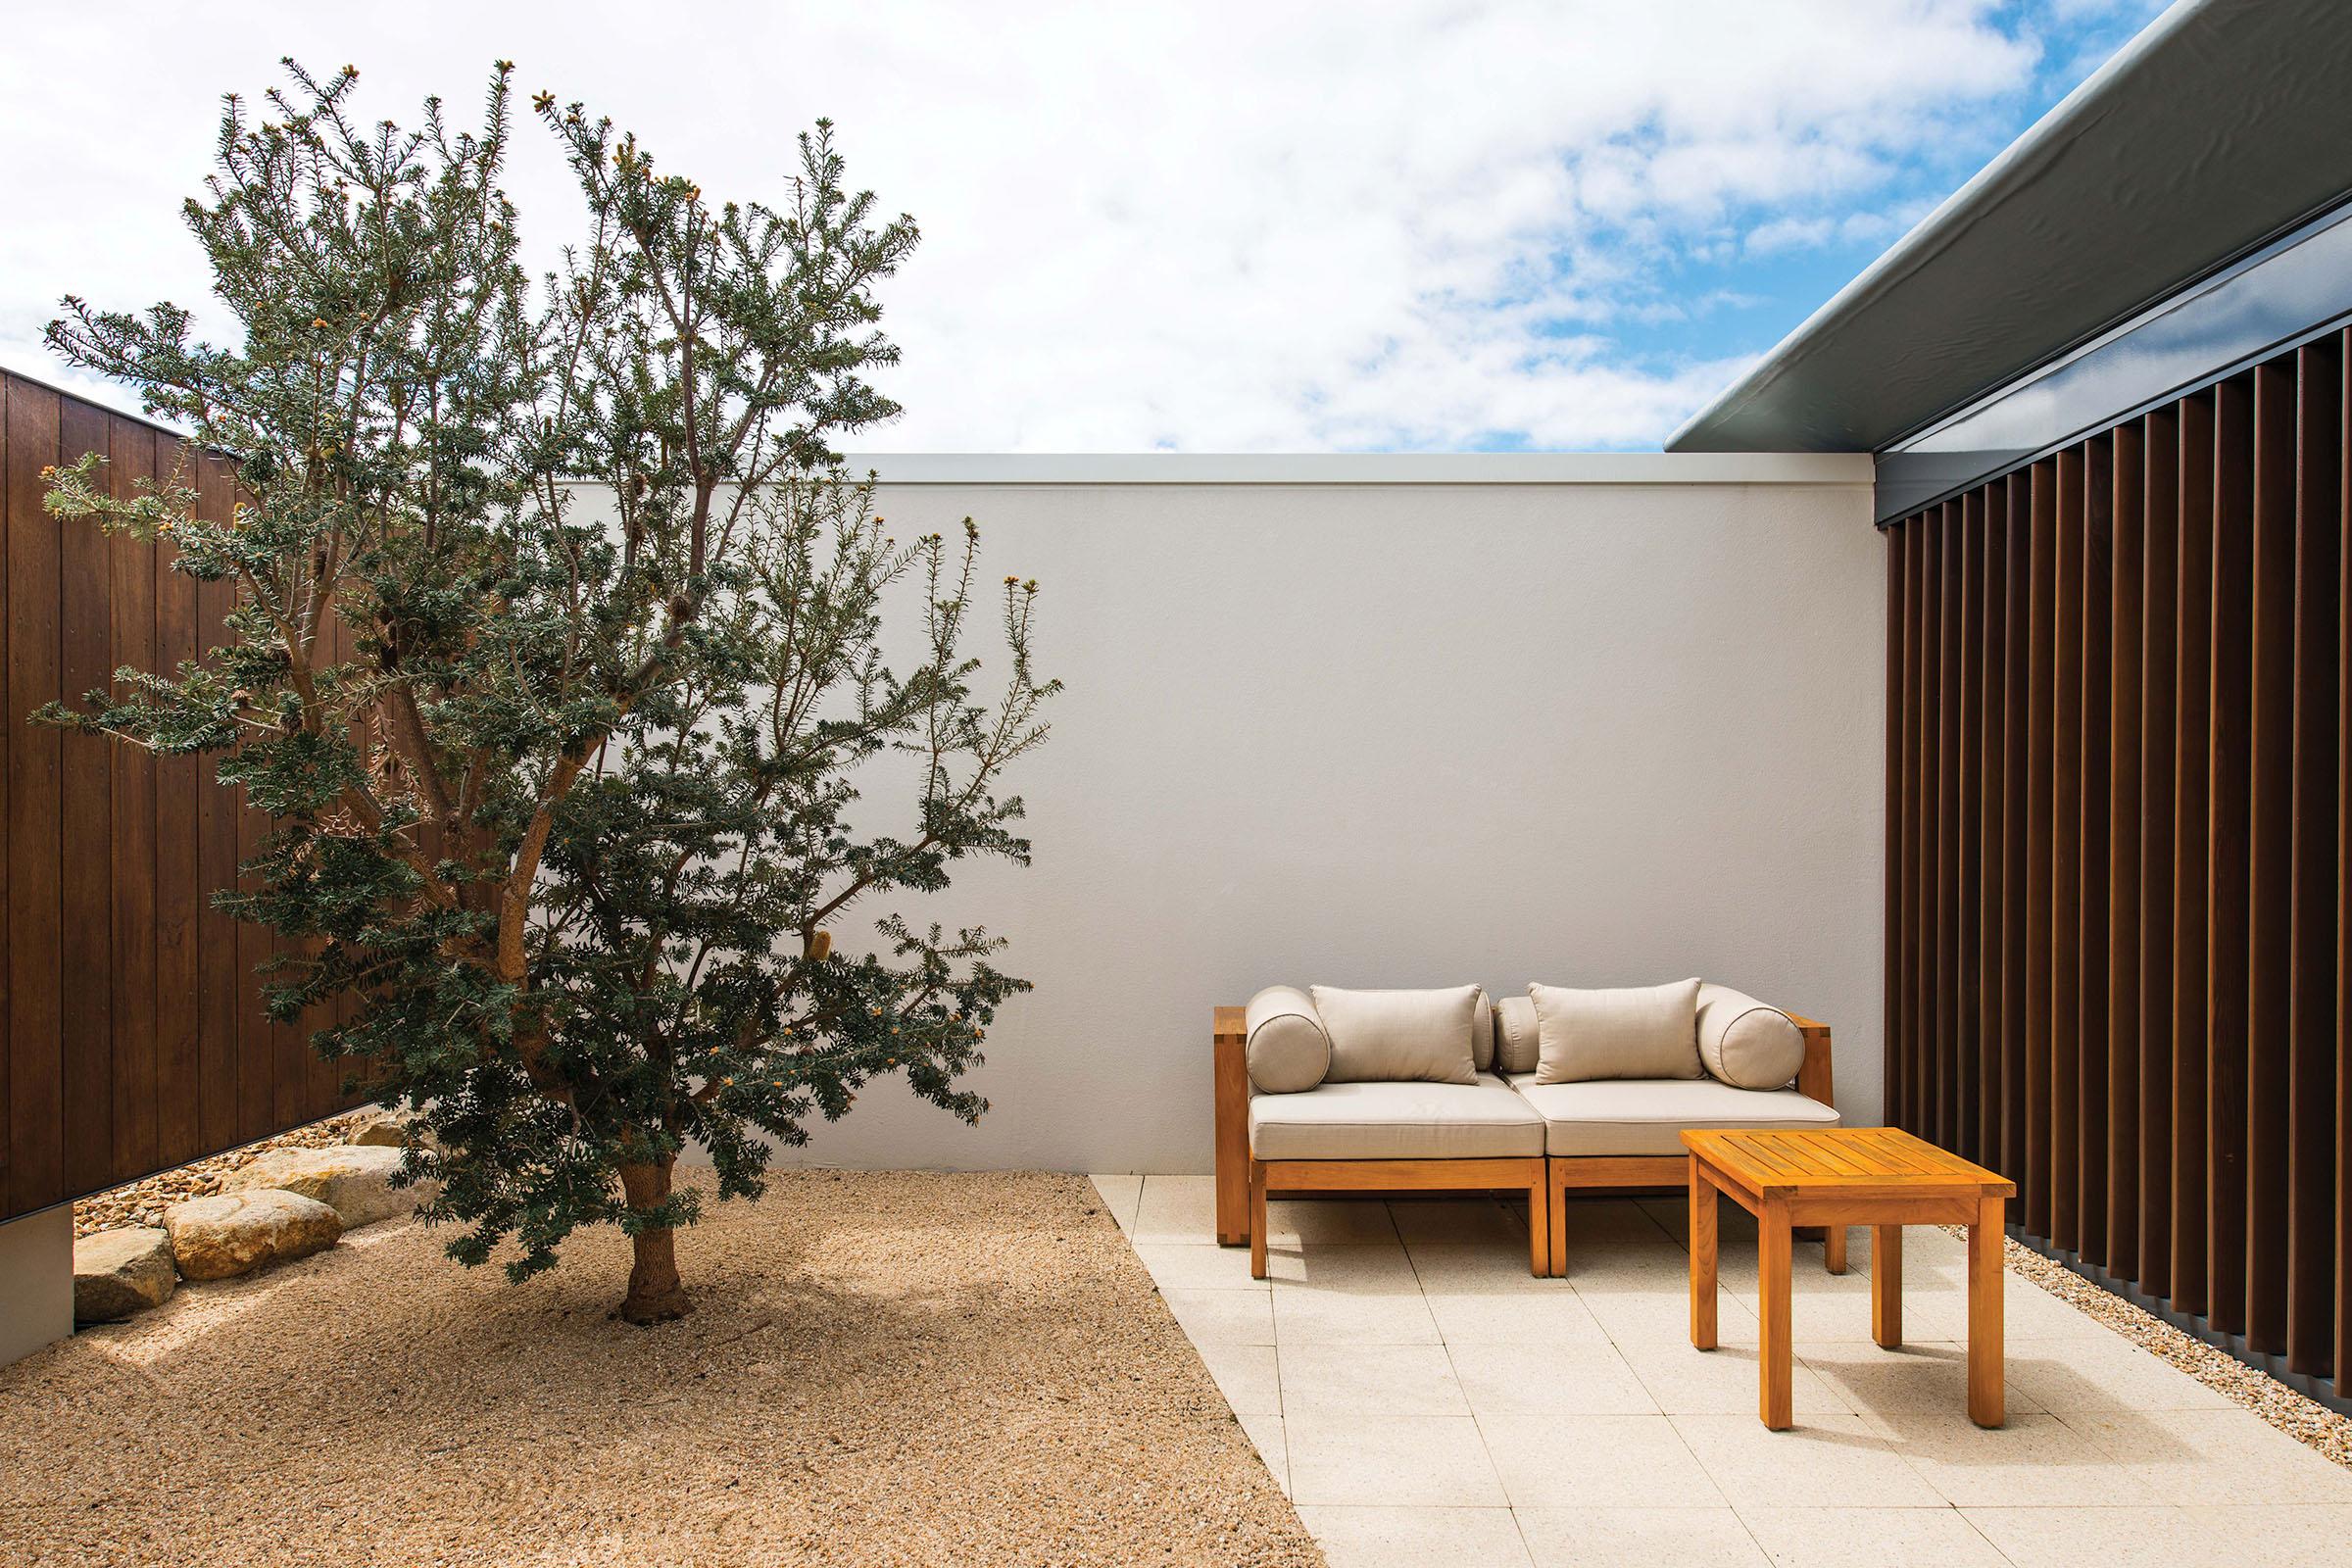 Saffire Freycinet - Luxury resort and lodges Tasmania